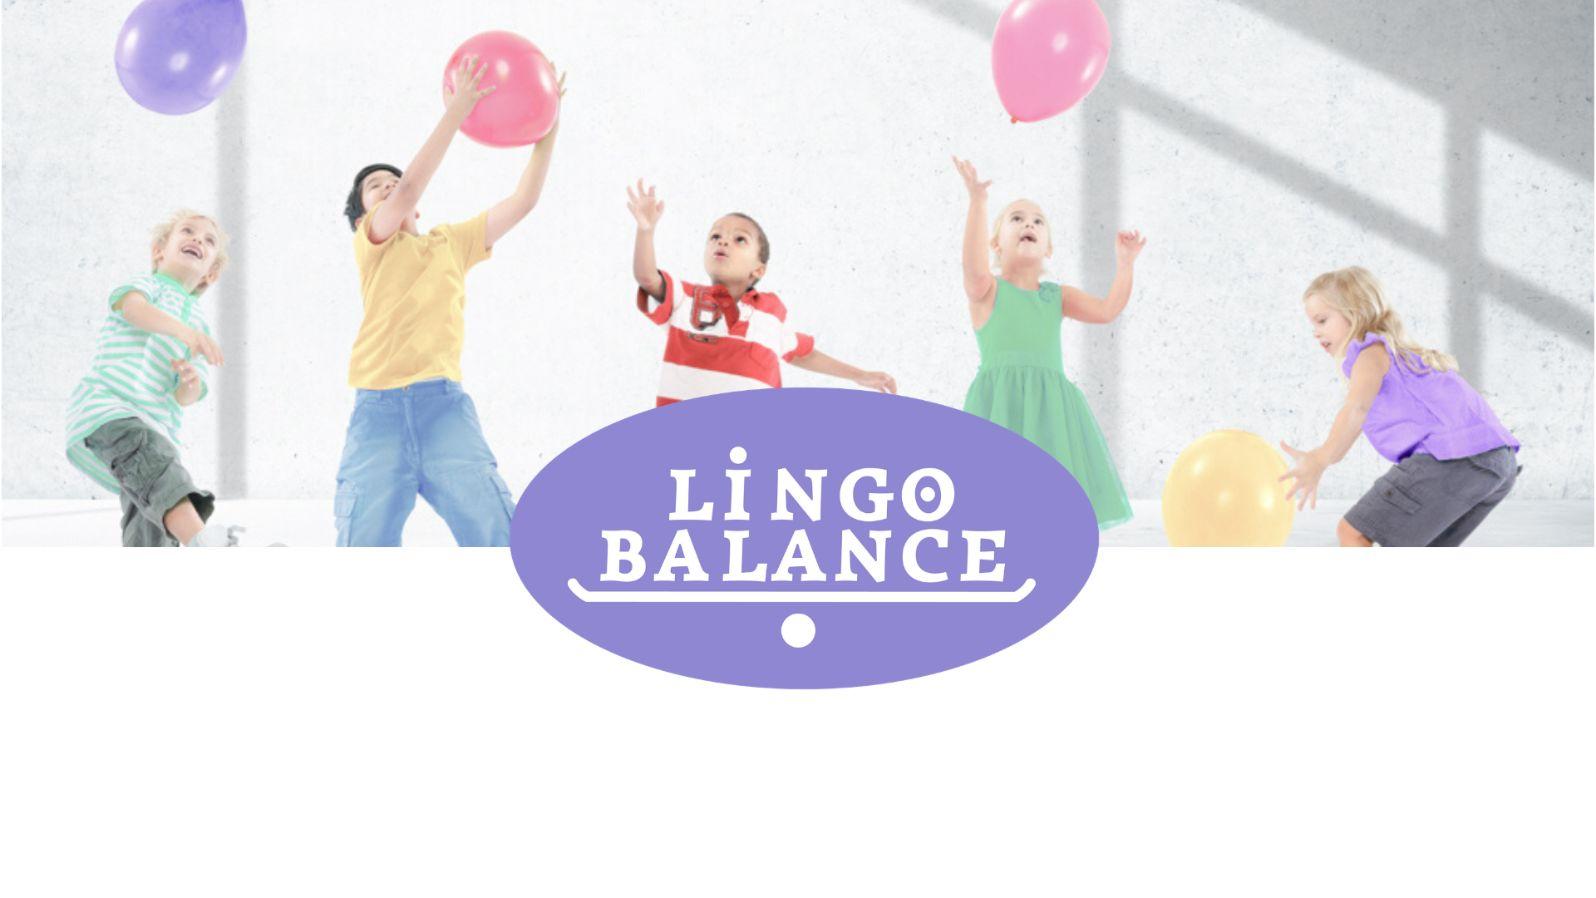 Benefits of bilingualism. lingobalance.com